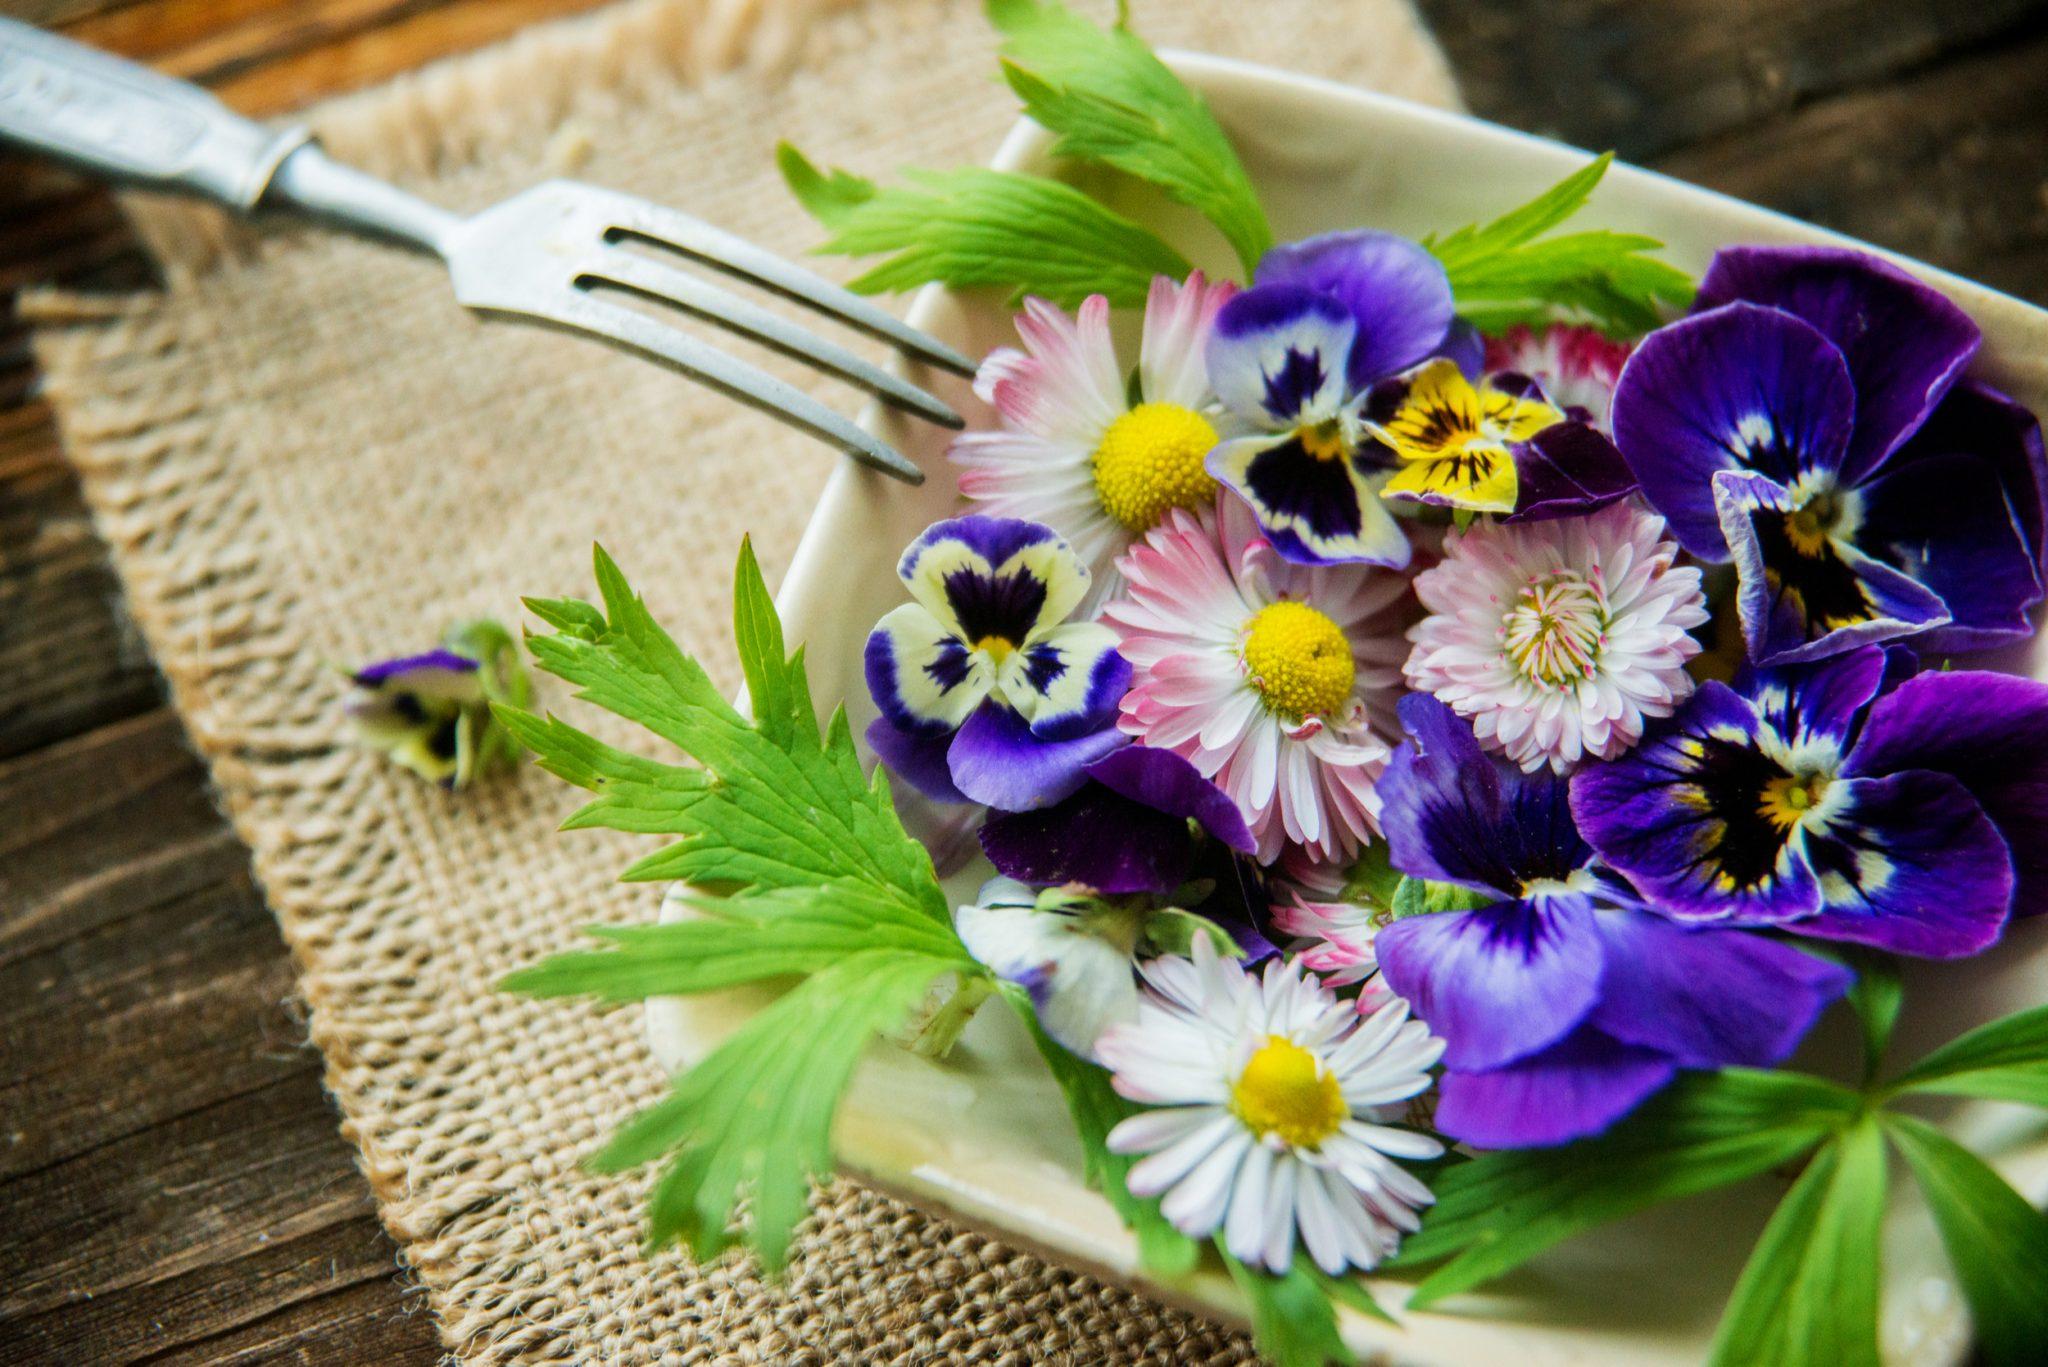 flower bed images